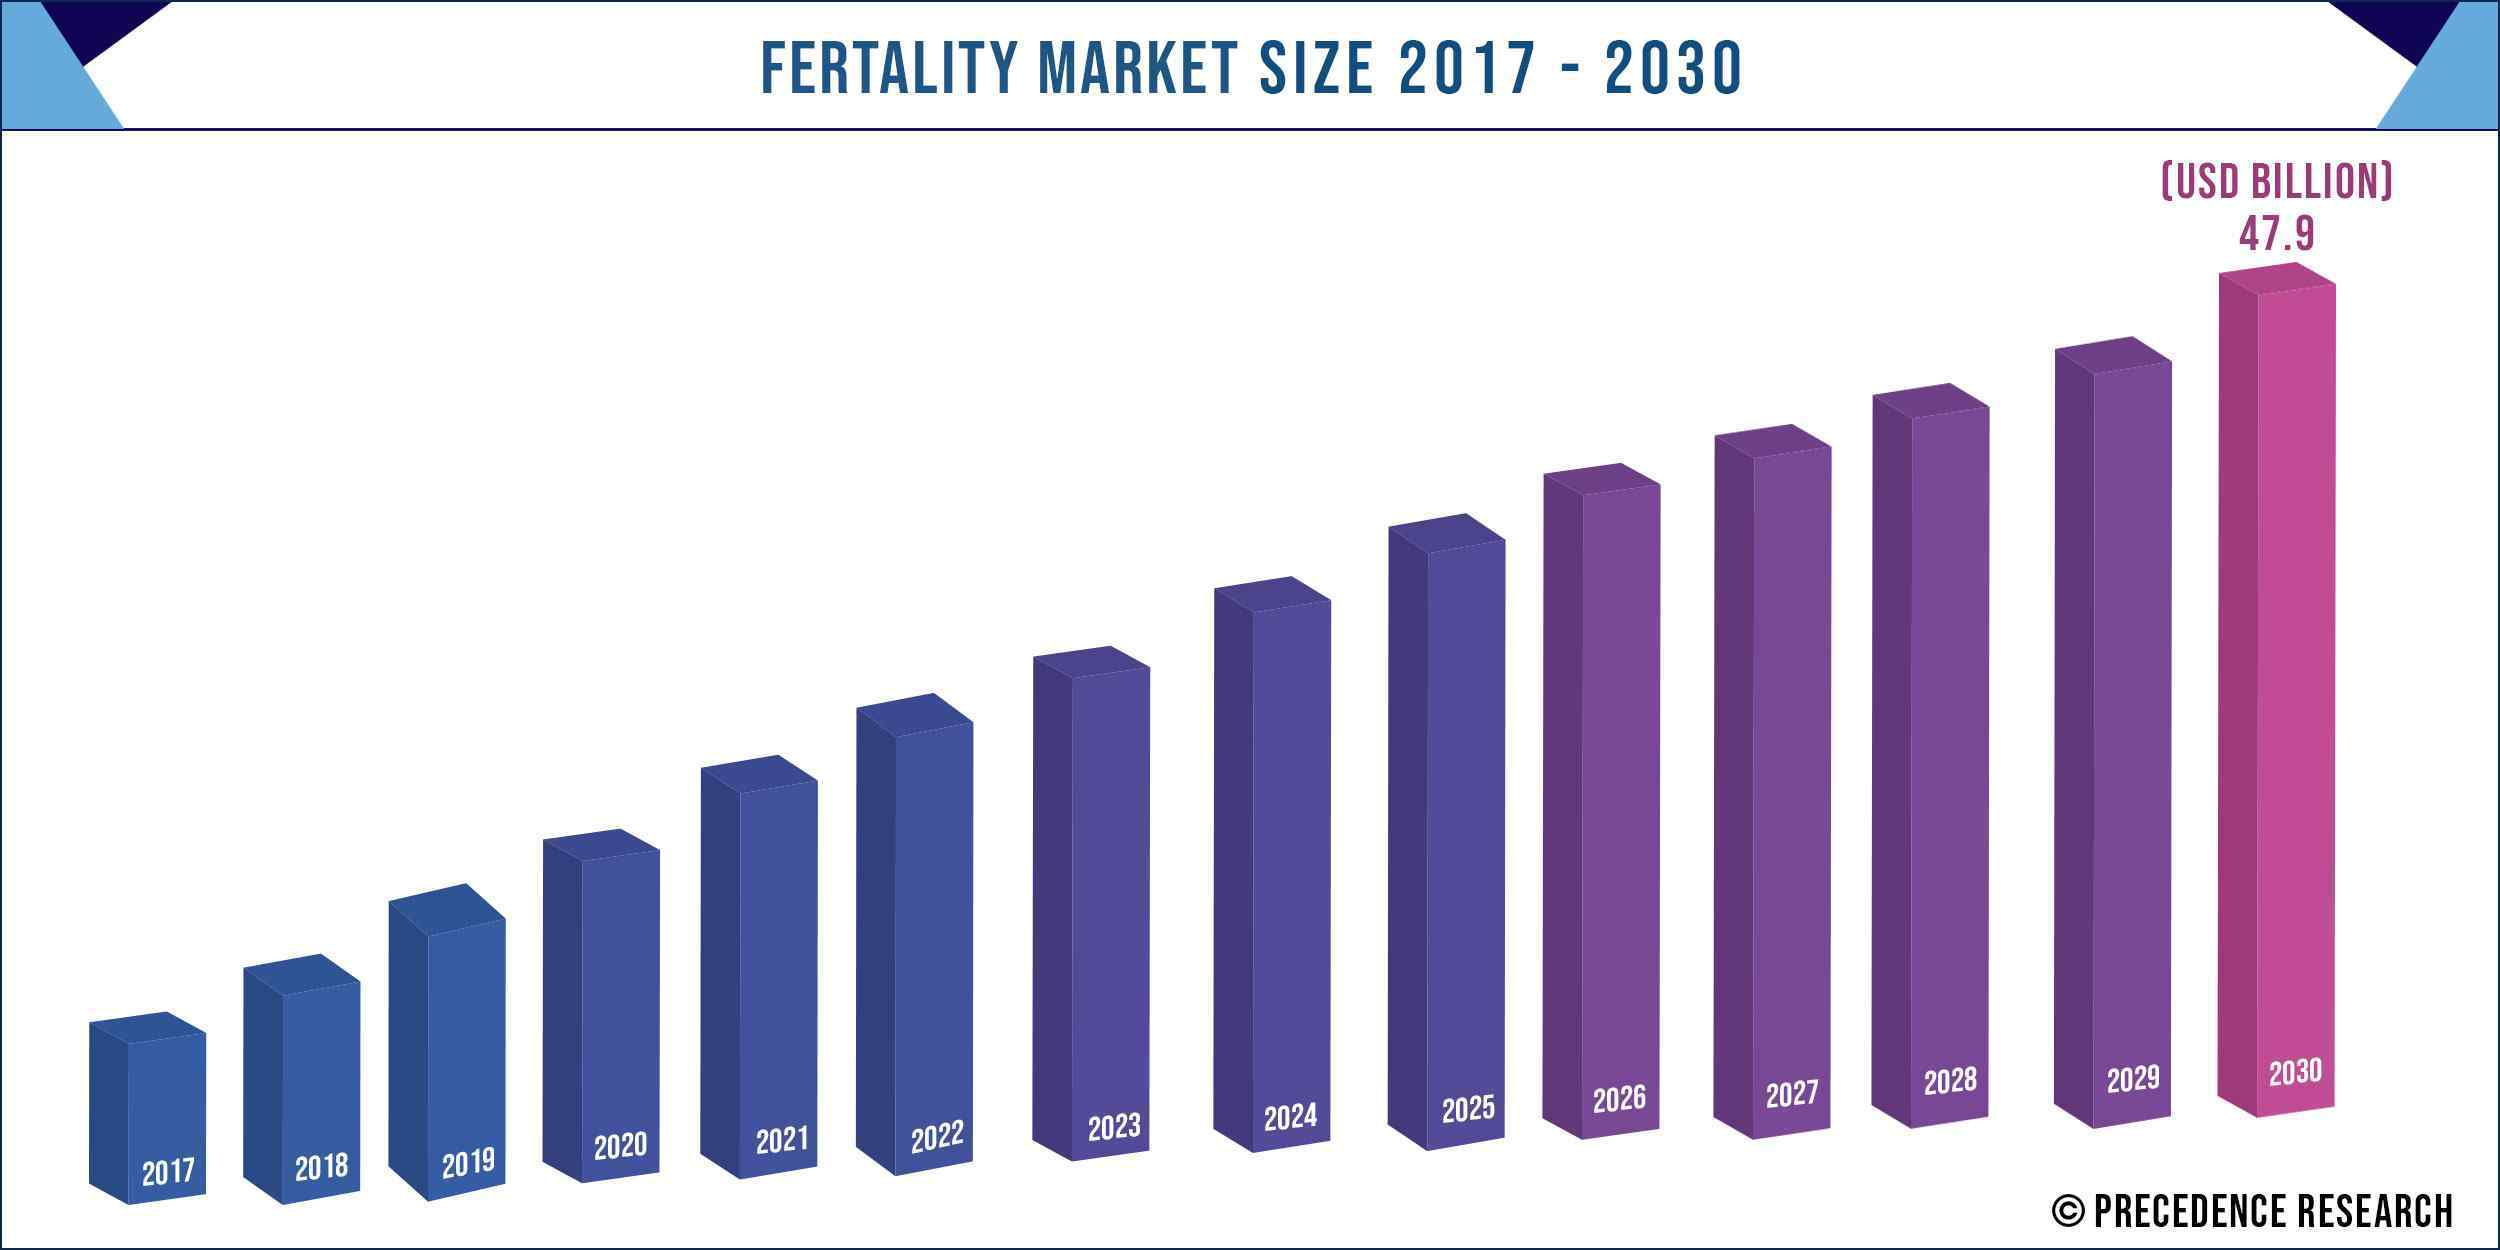 Fertality Market Size 2017 to 2030